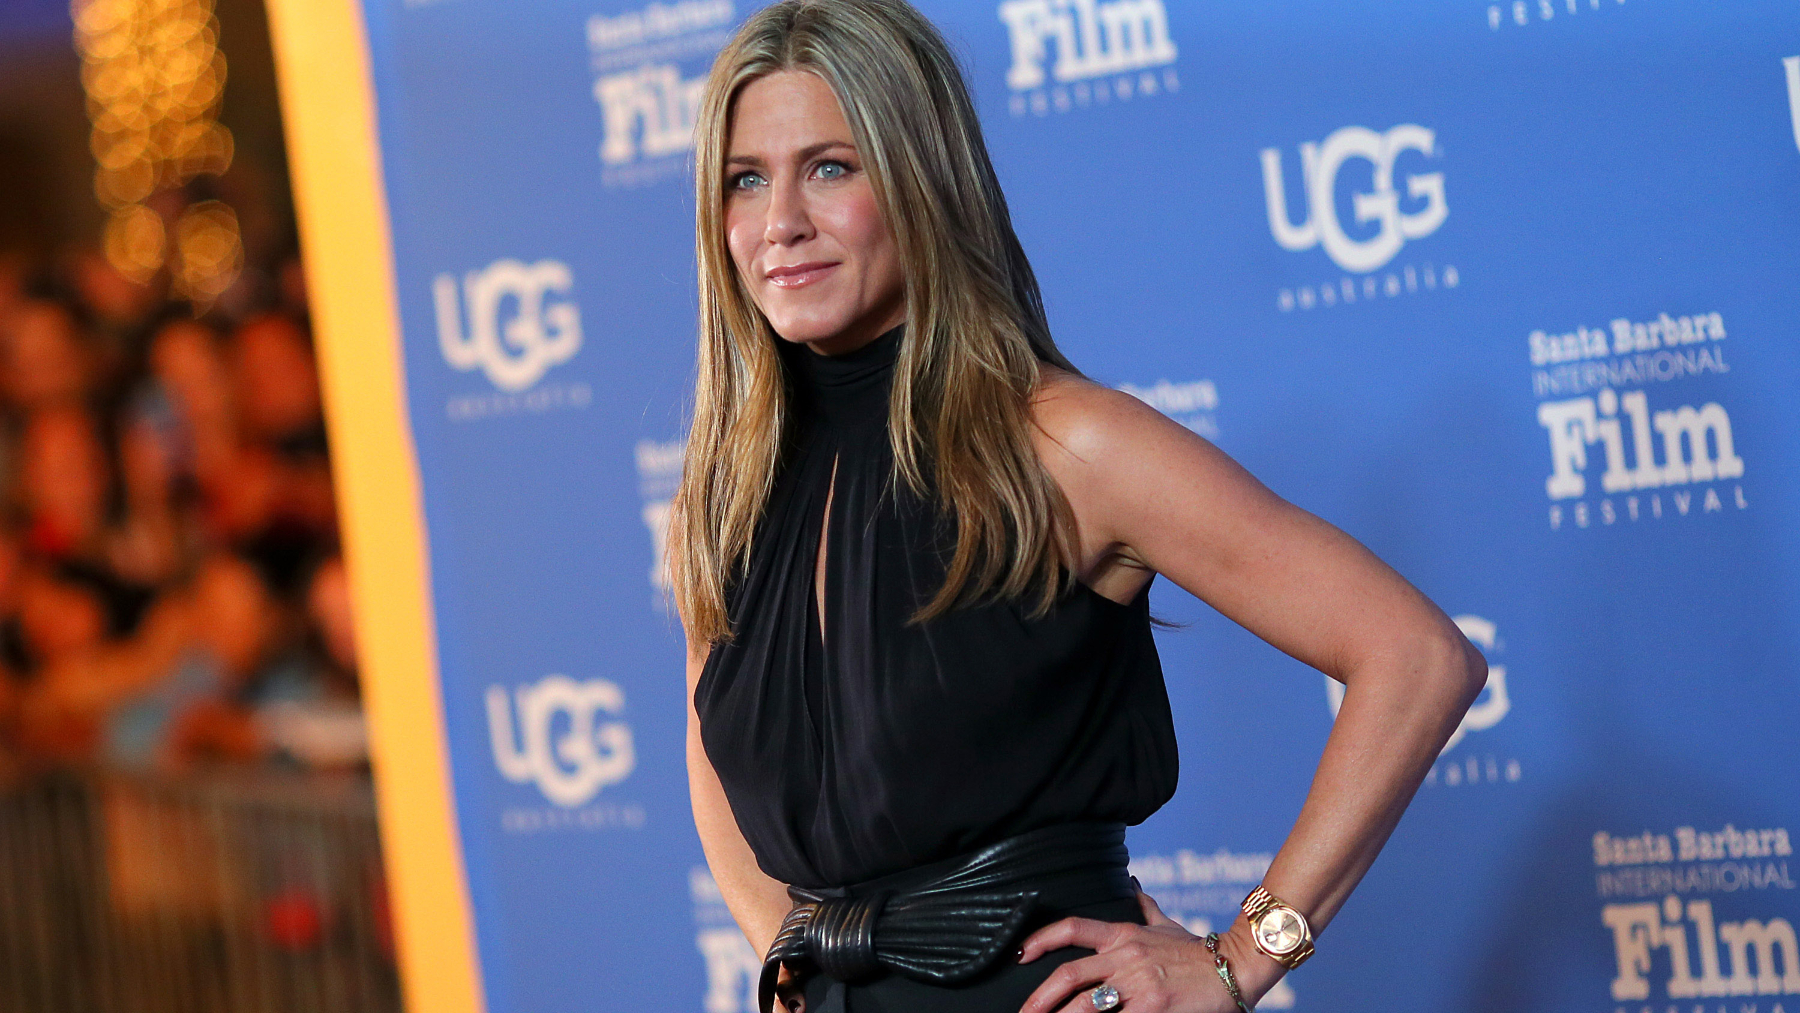 La actriz Jennifer Aniston/Foto: Getty Images